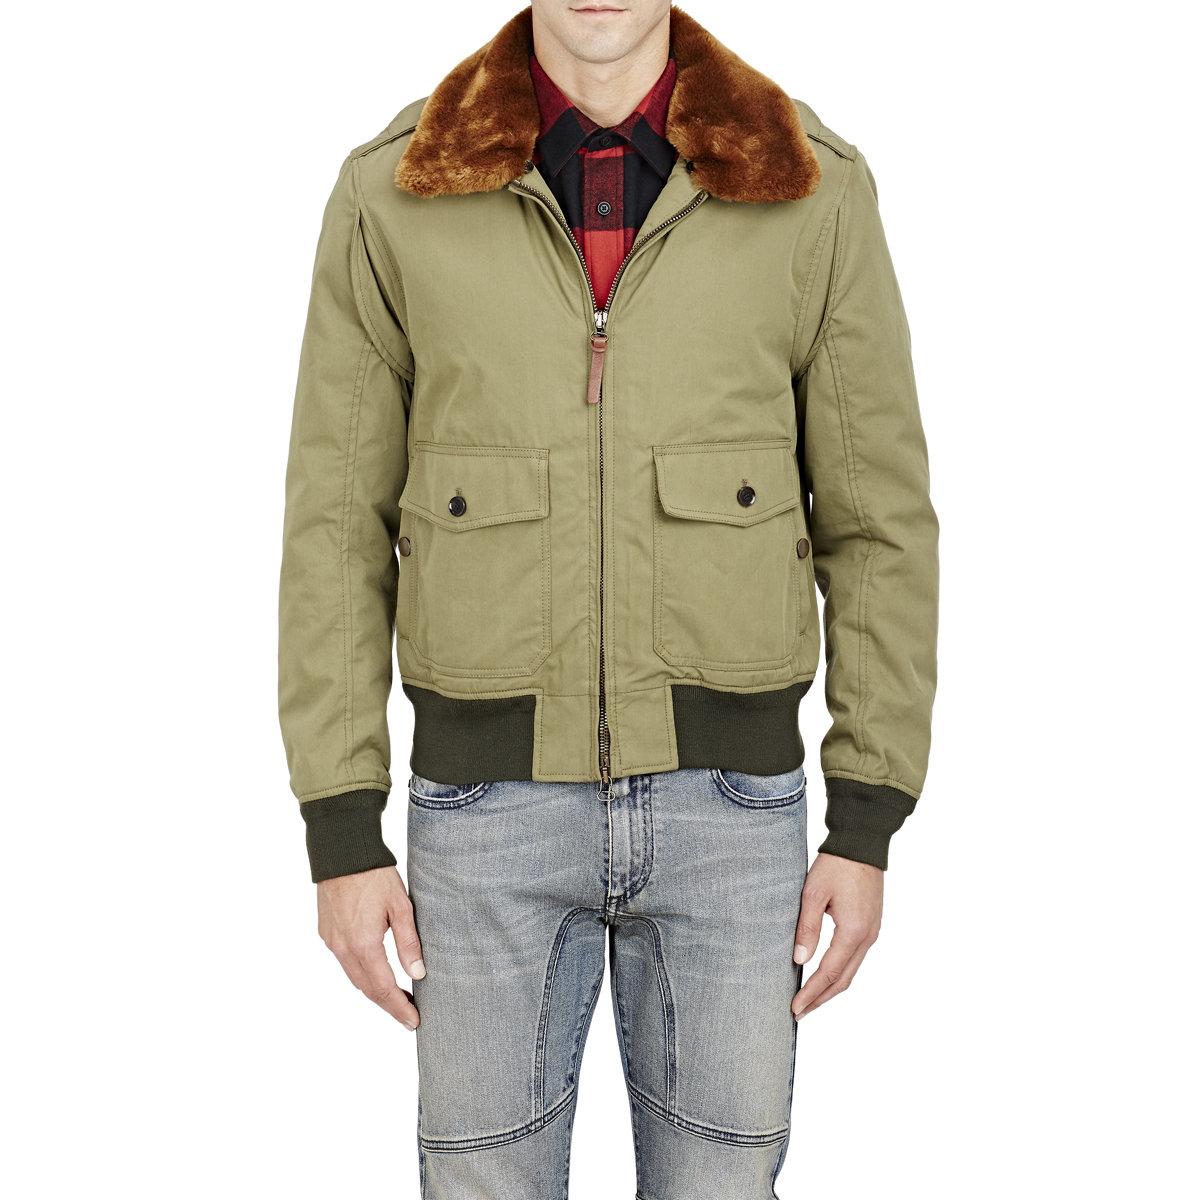 Belstaff Green Bomber Jacket